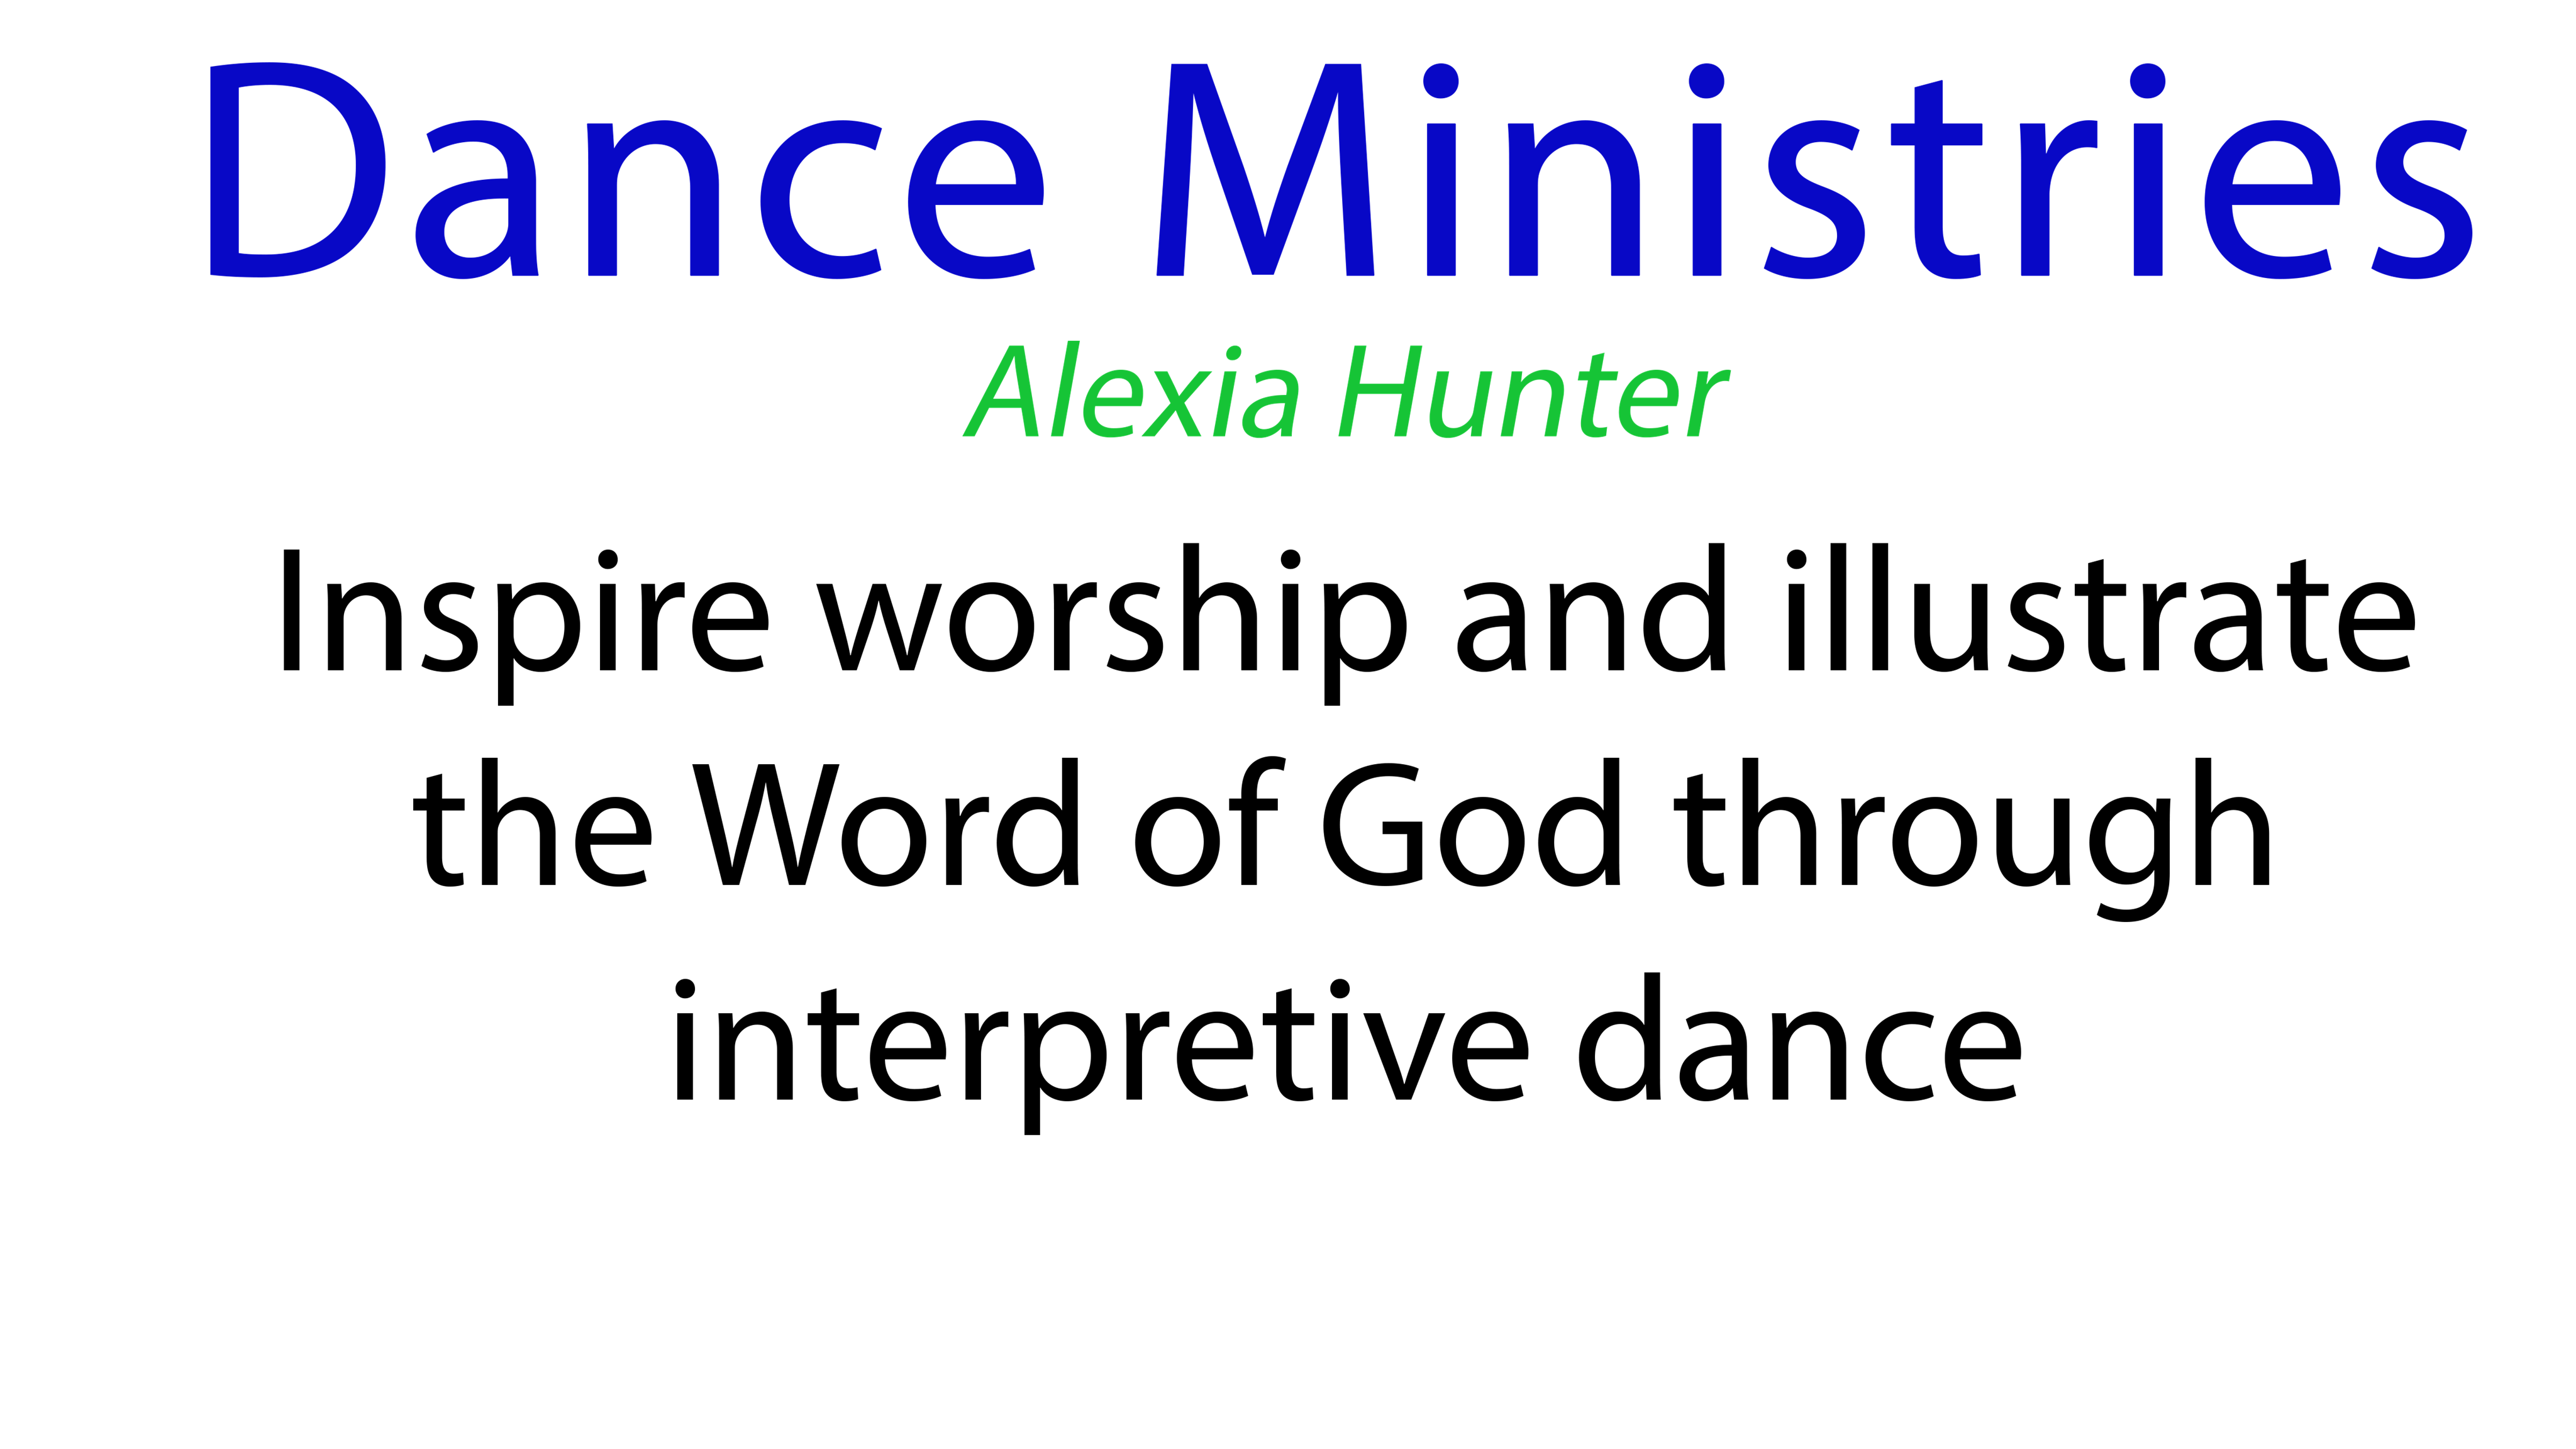 Dance Ministries